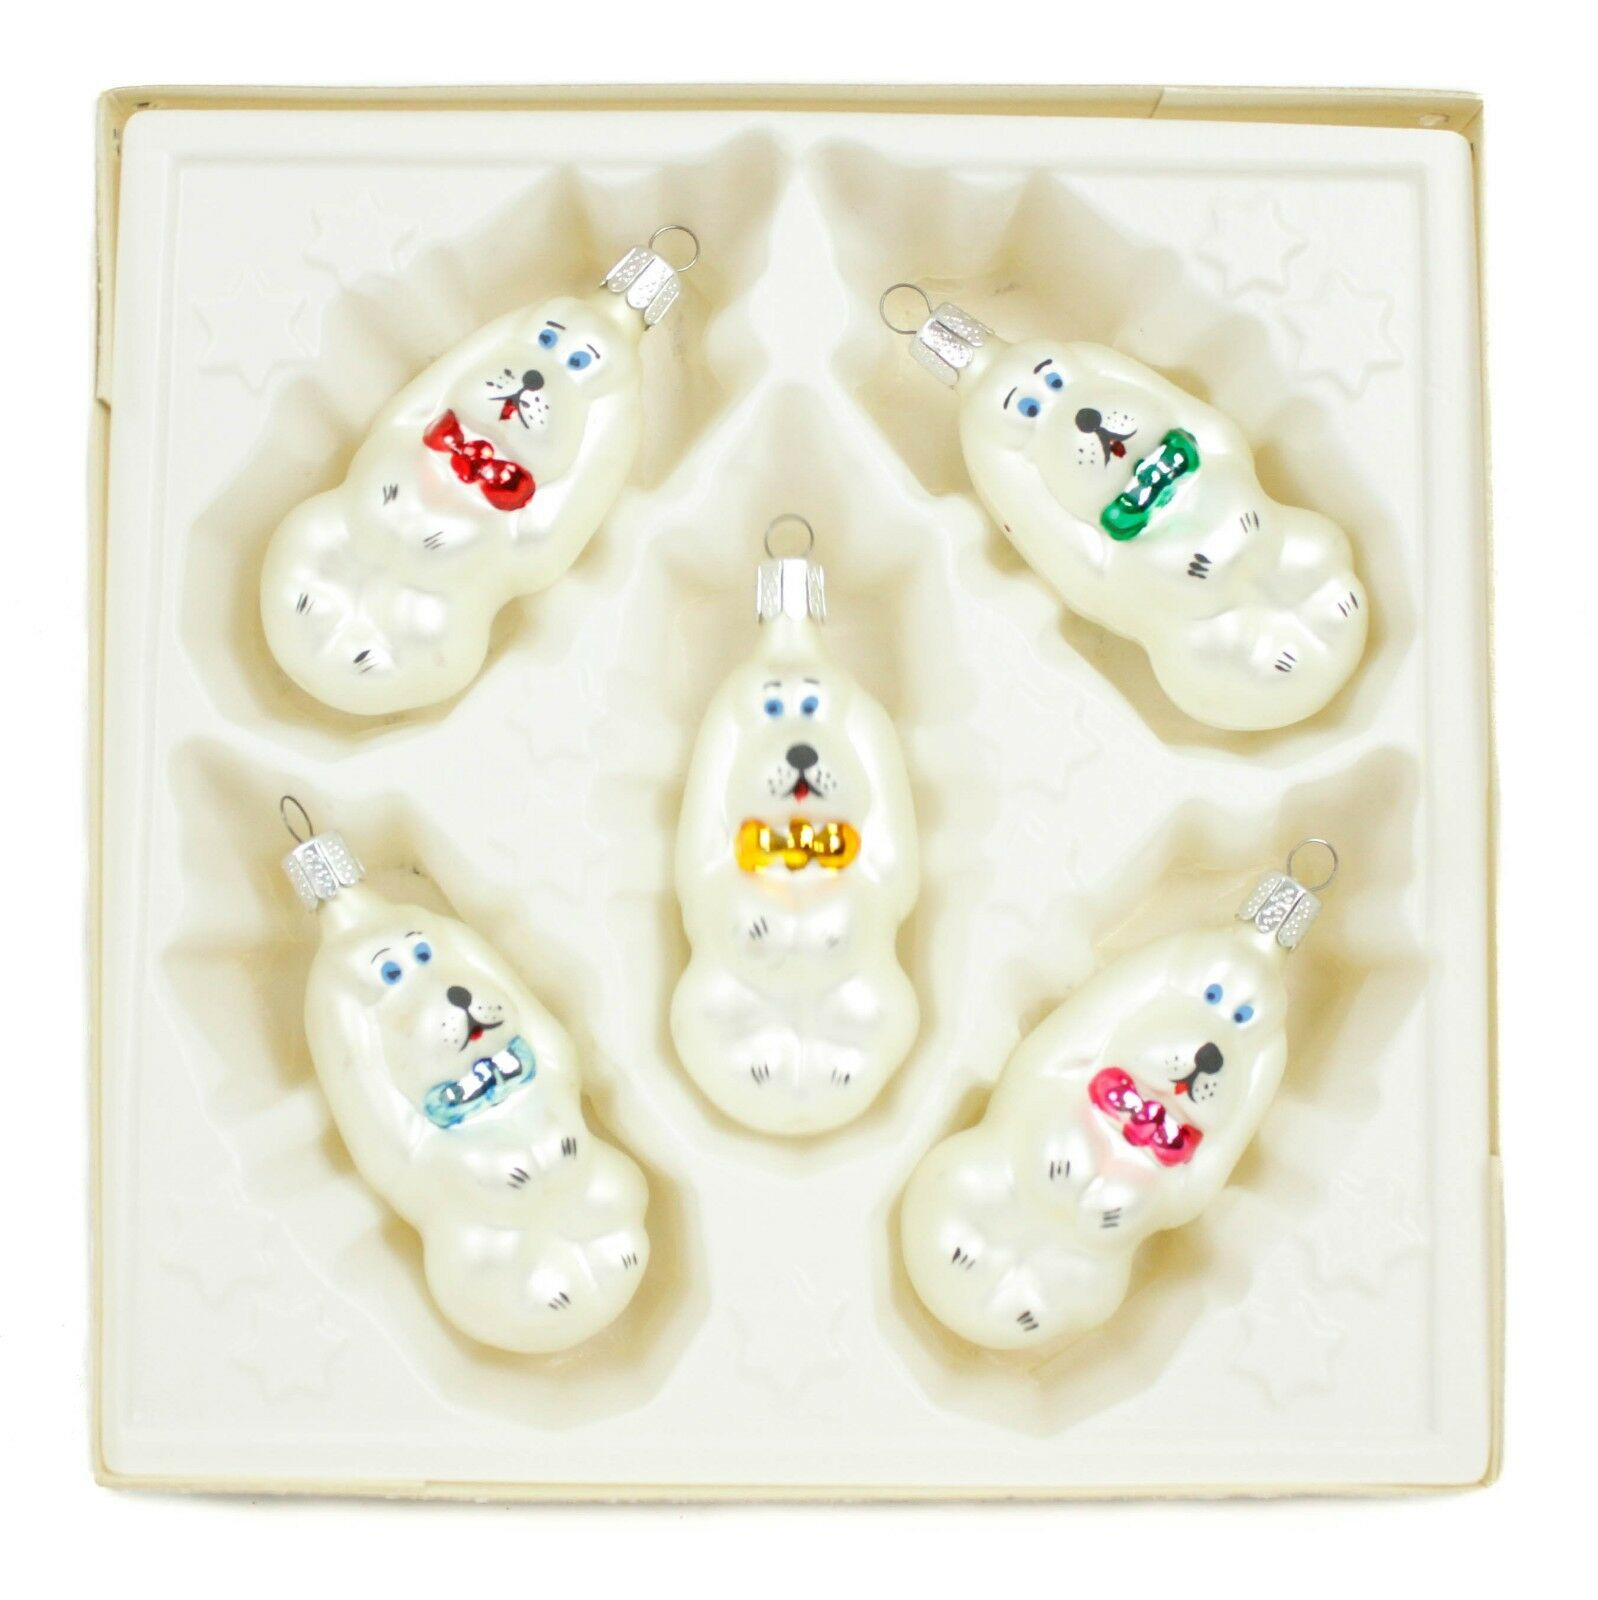 Bow Tie Weiß Dog Vintage Handblown Handblown Handblown Eastern Europe Glass Christmas Ornament Set bb86c1